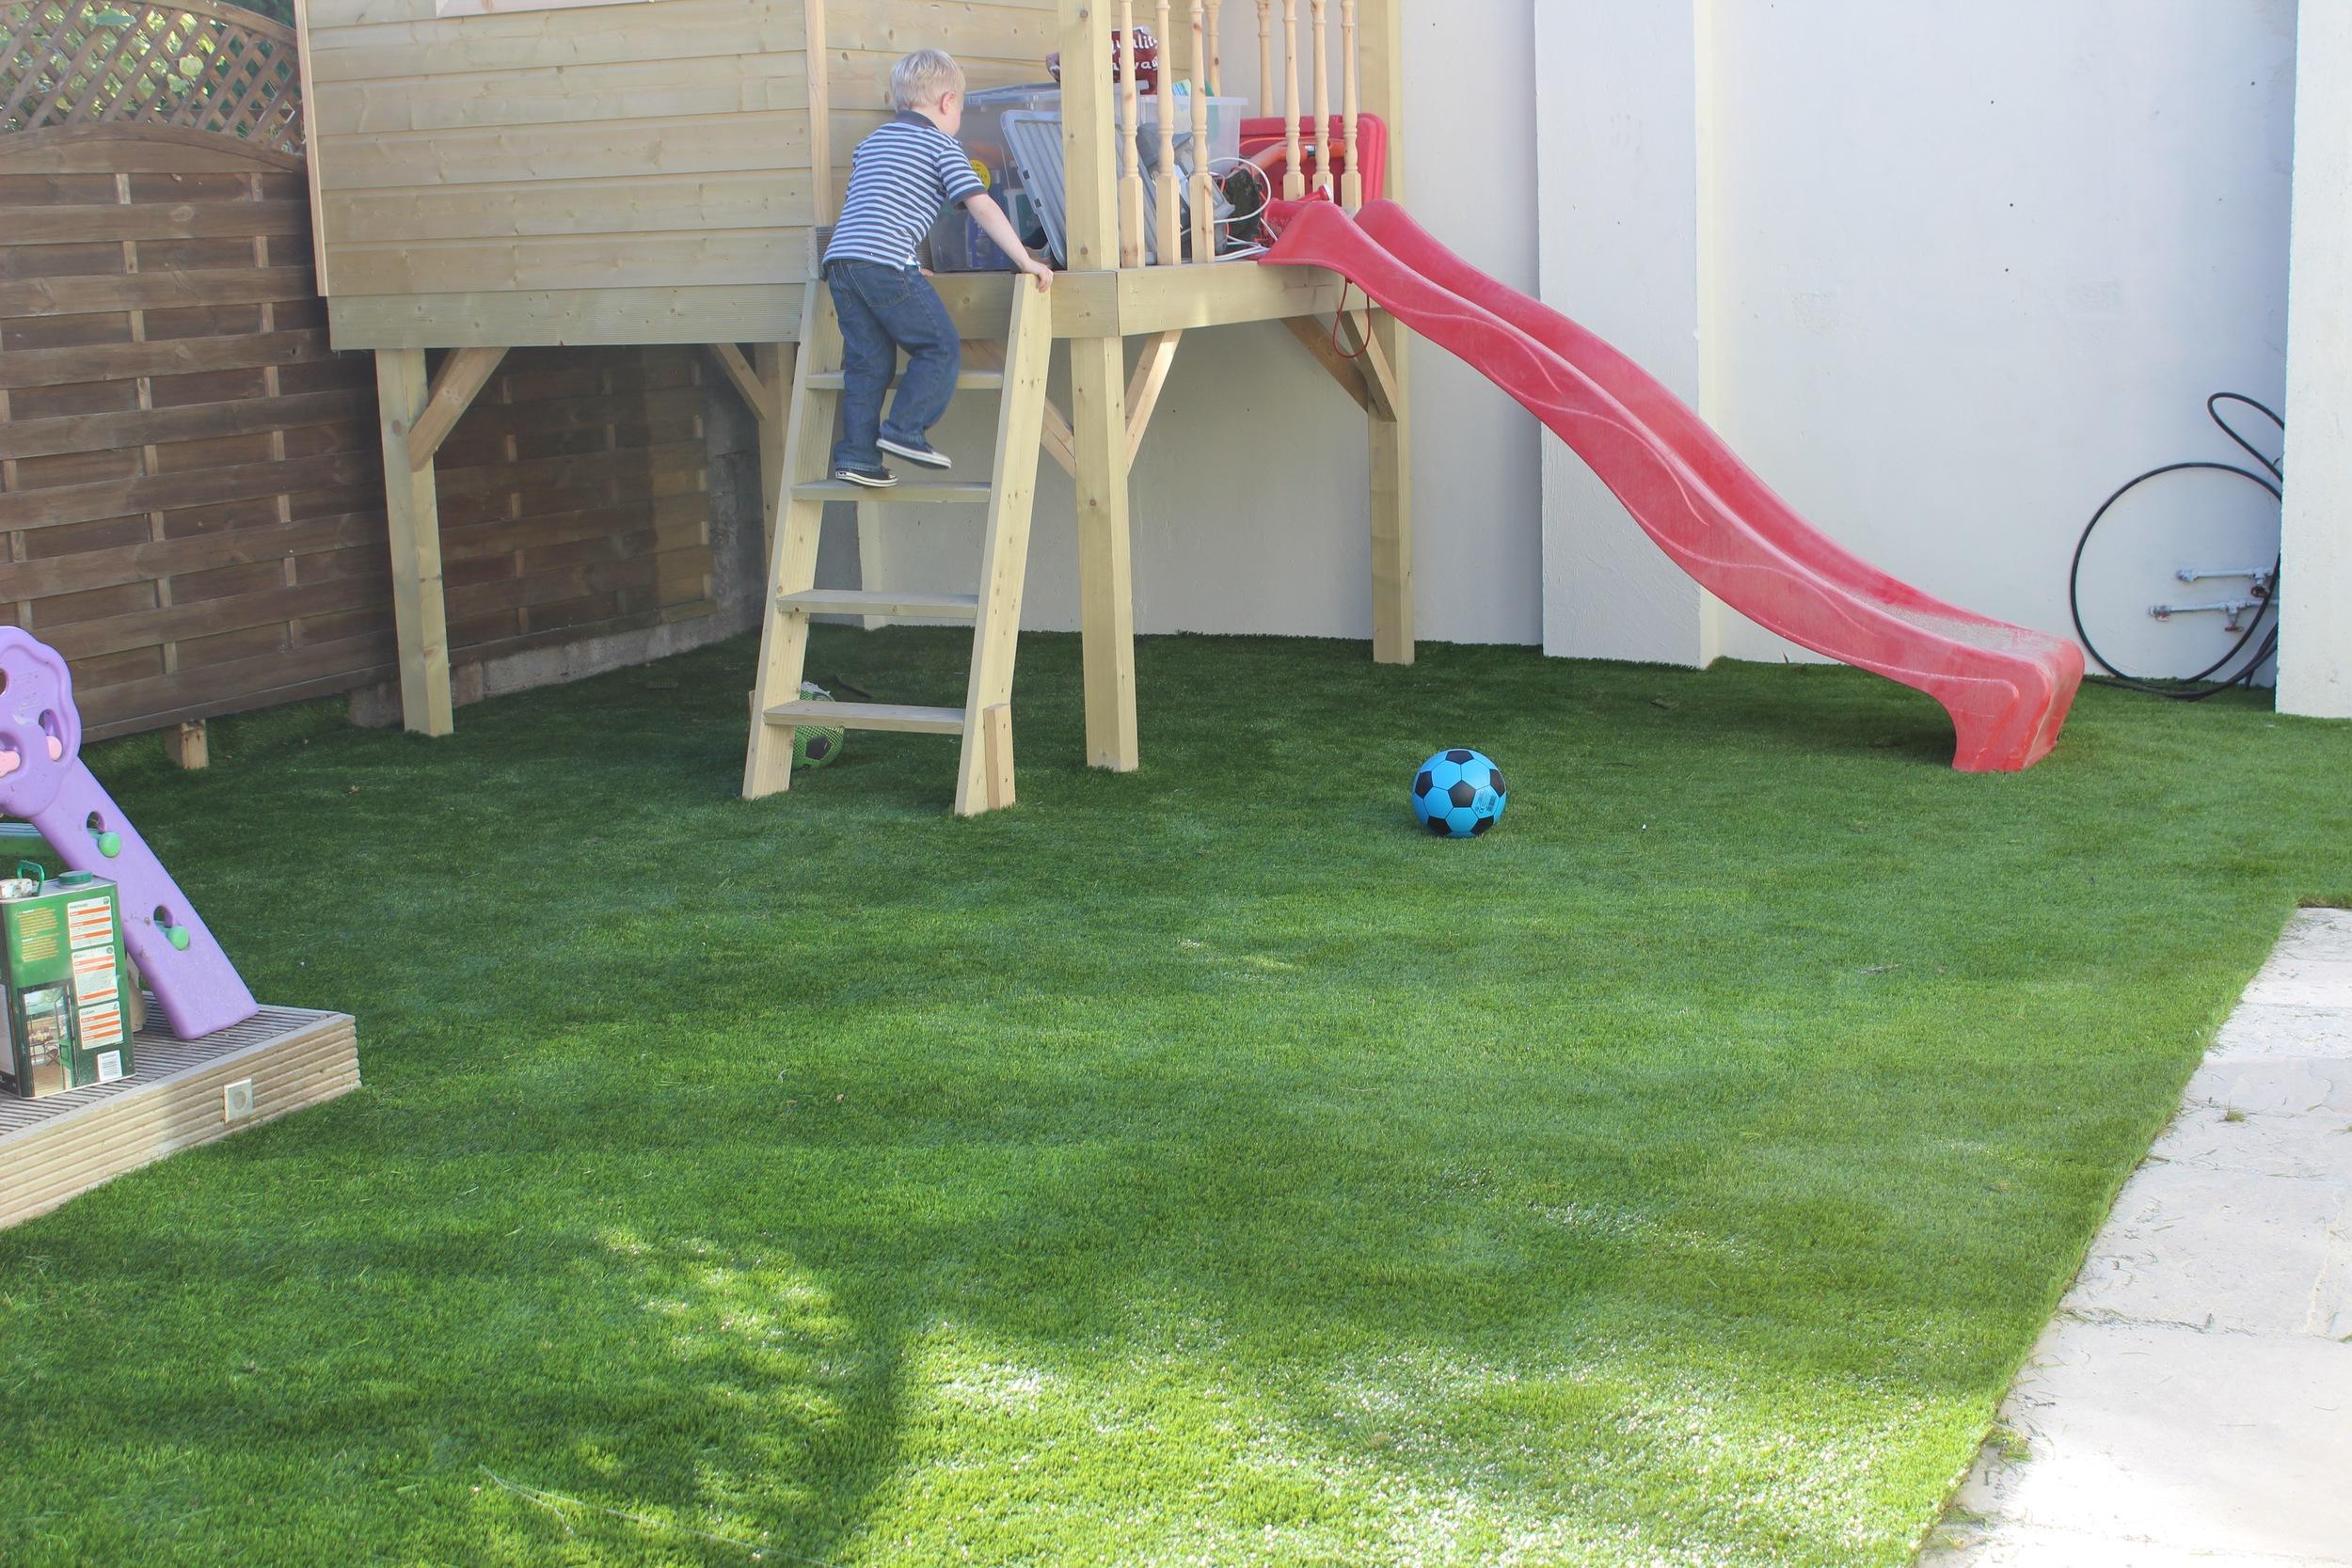 kids playing on playhouse